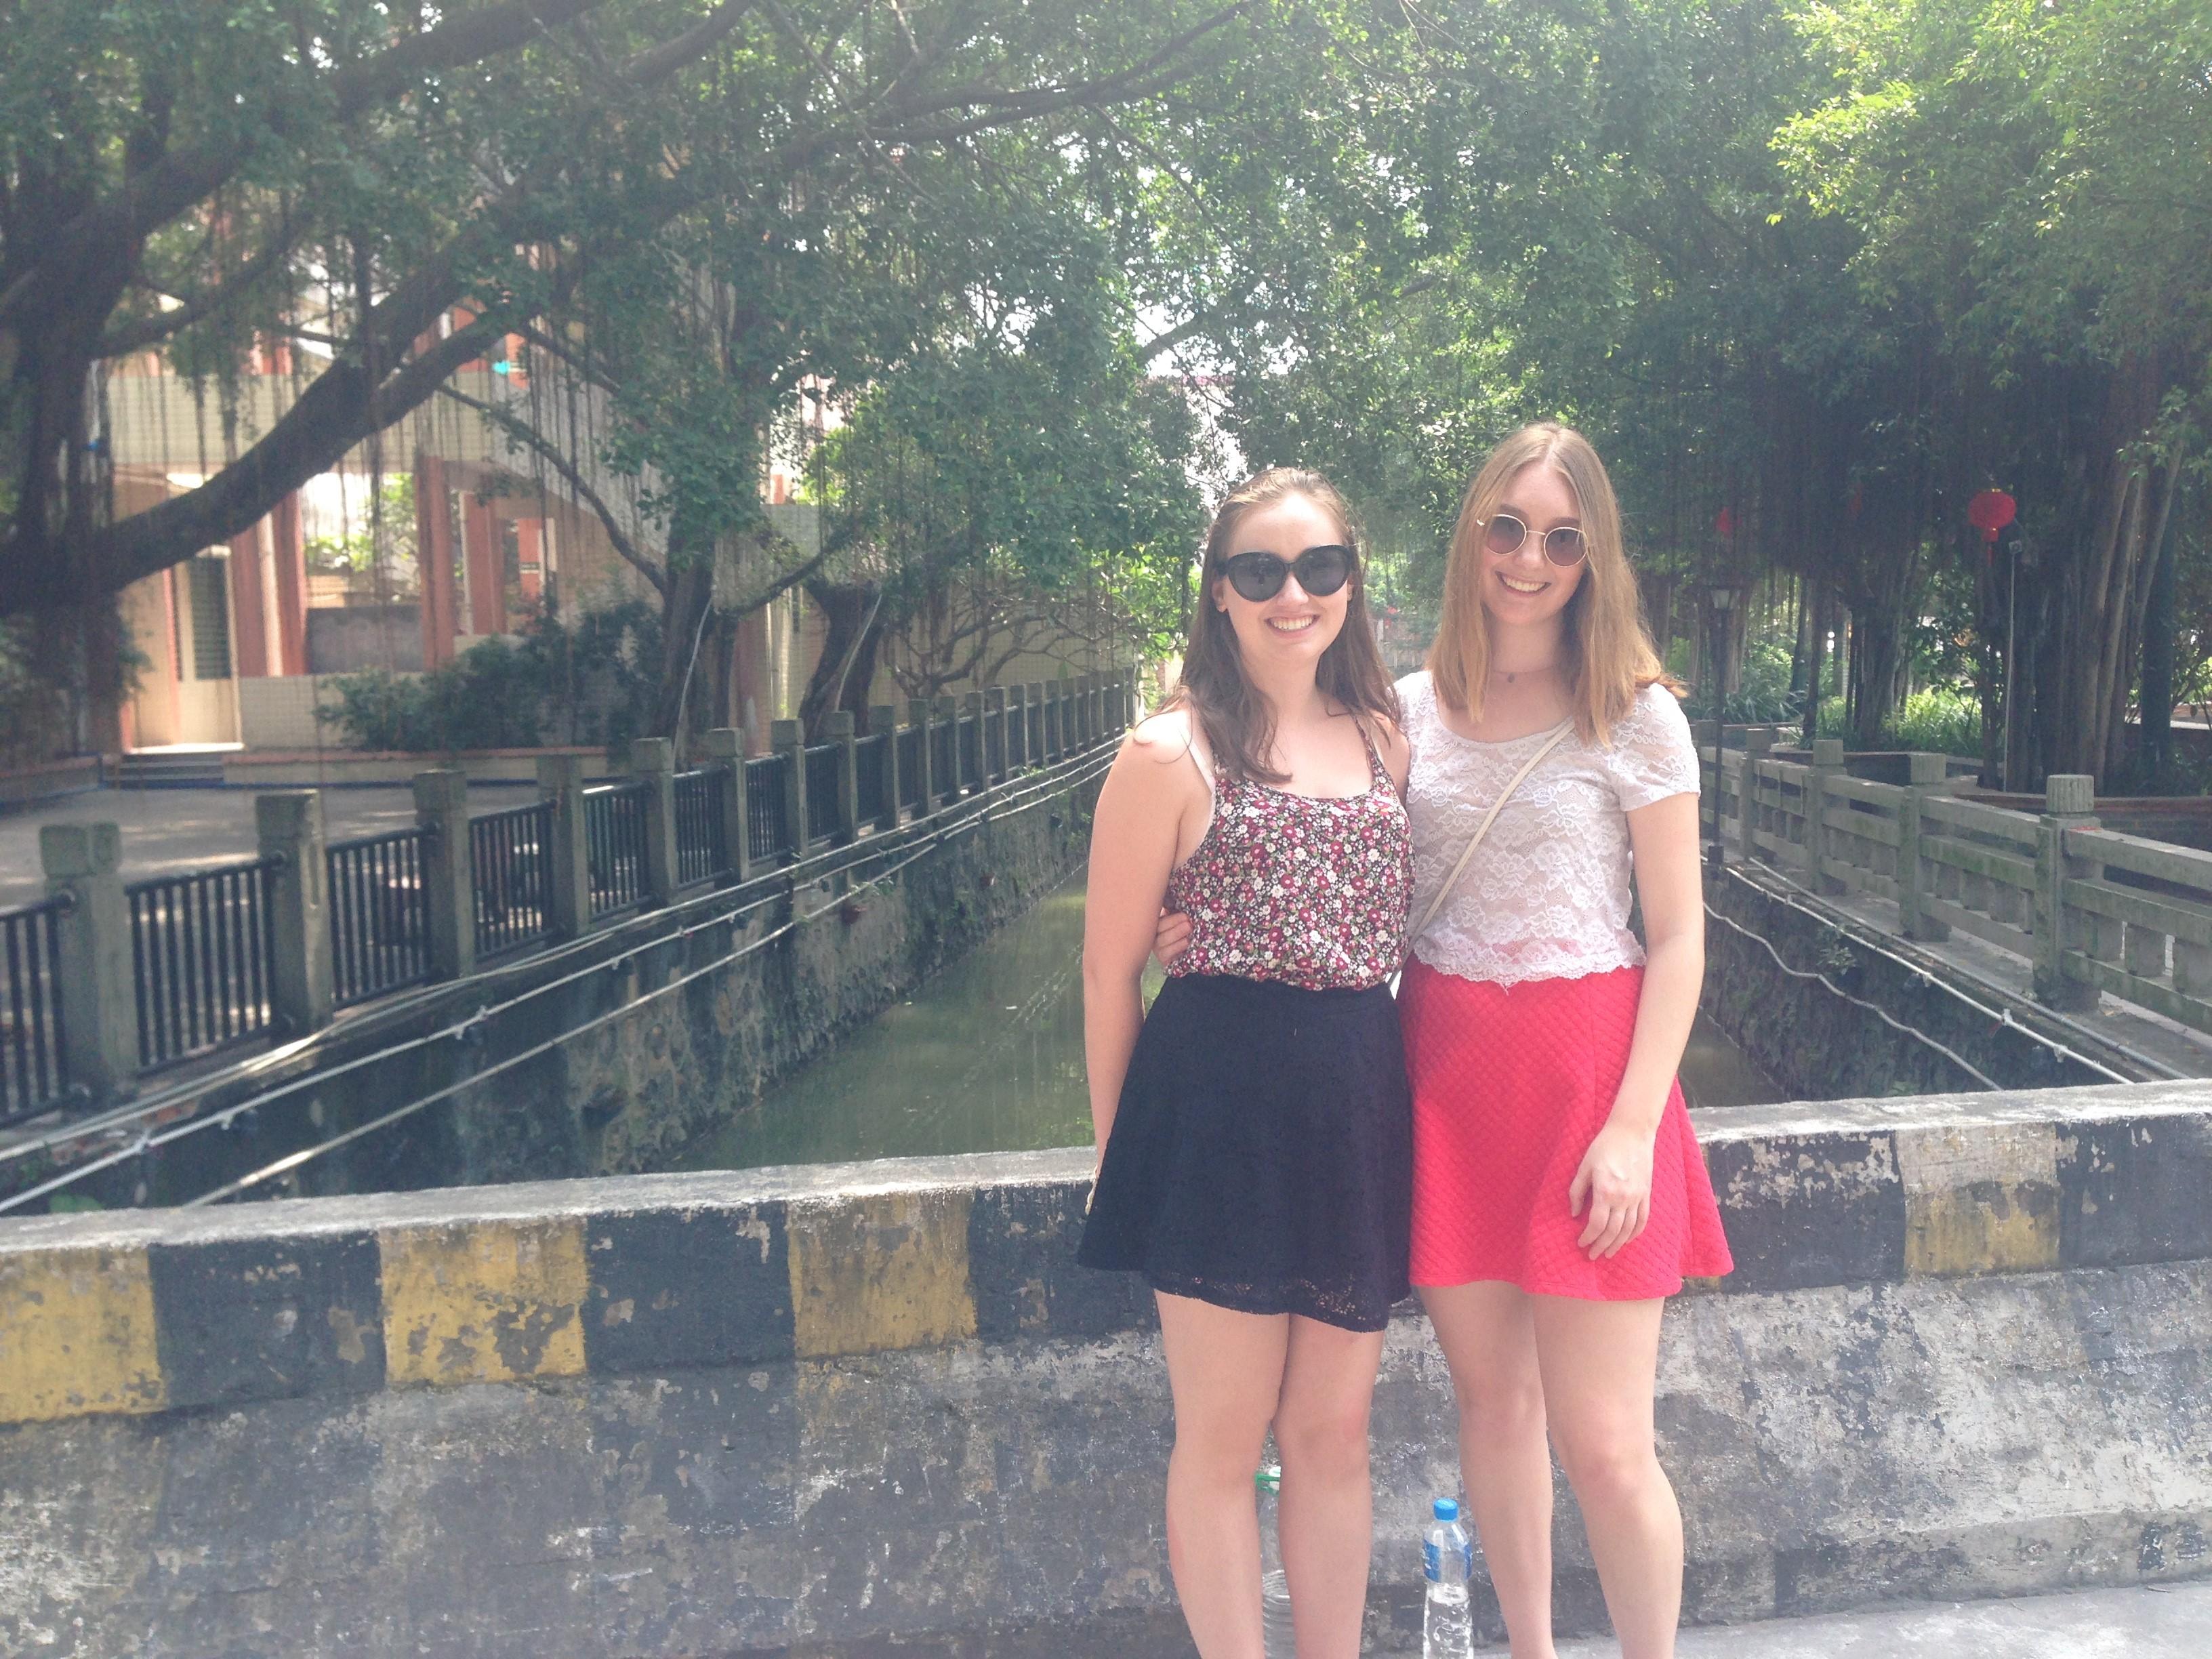 i-to-i China TEFL interns in Shun De water village, China